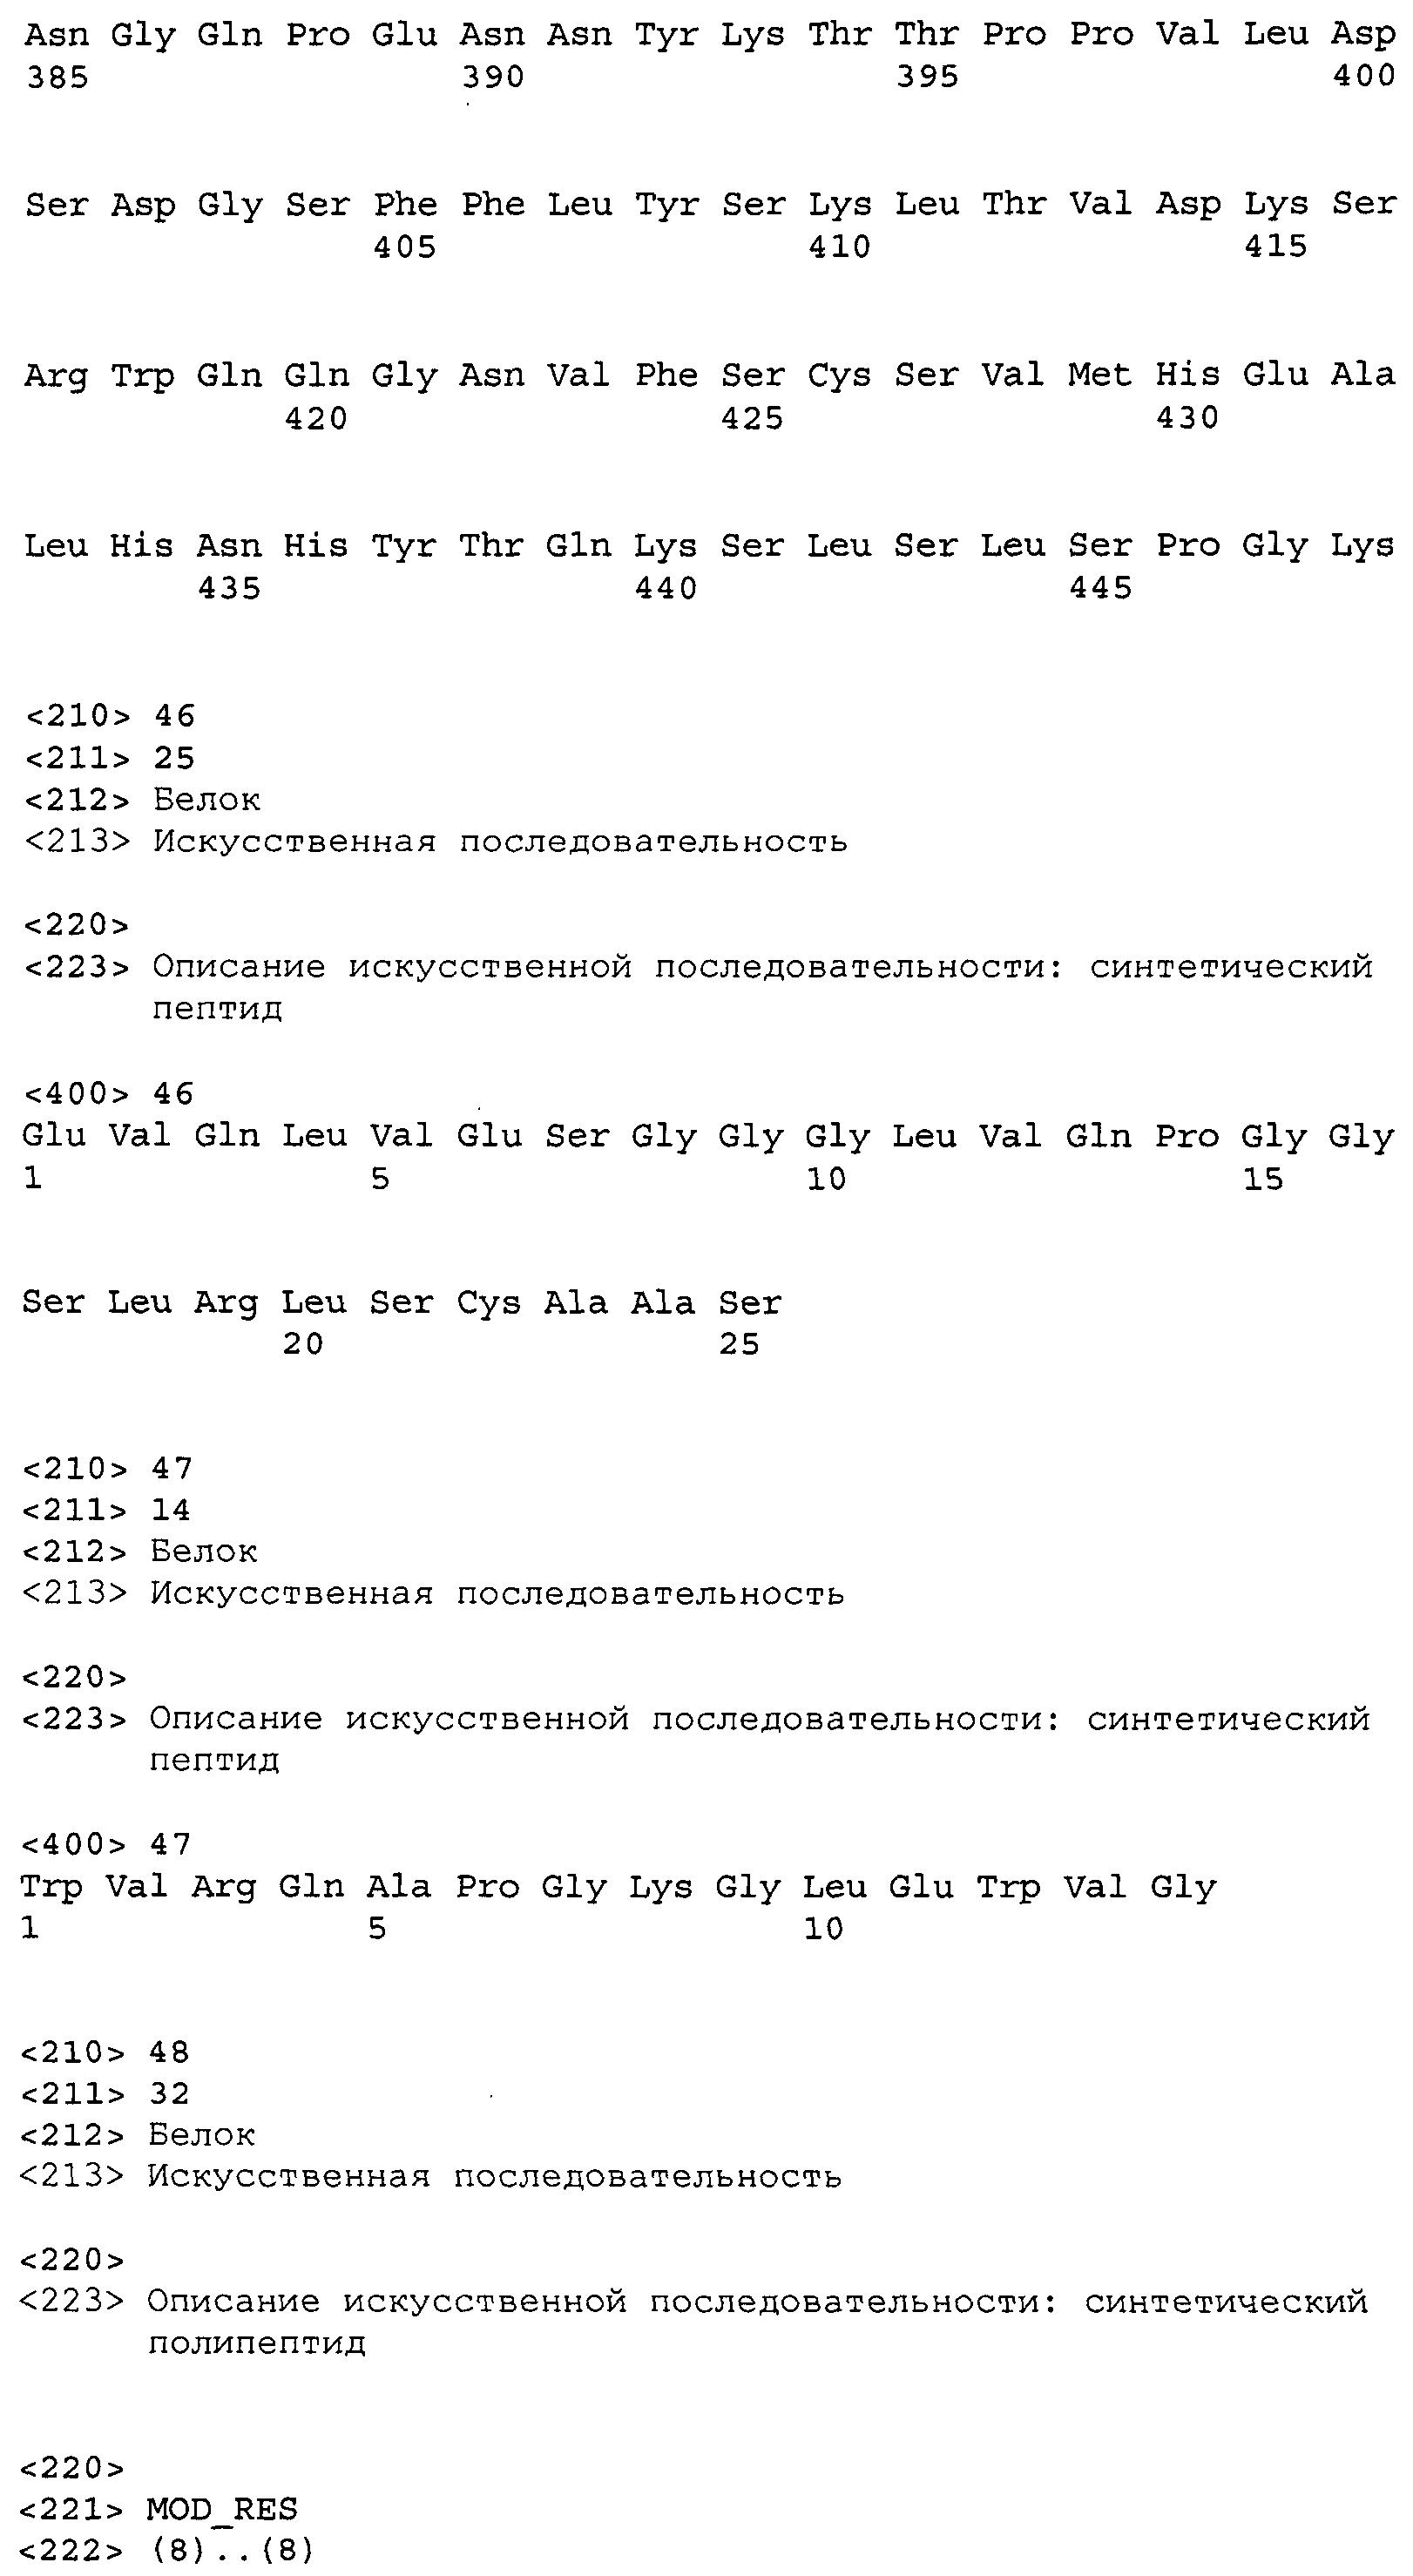 Figure 00000318